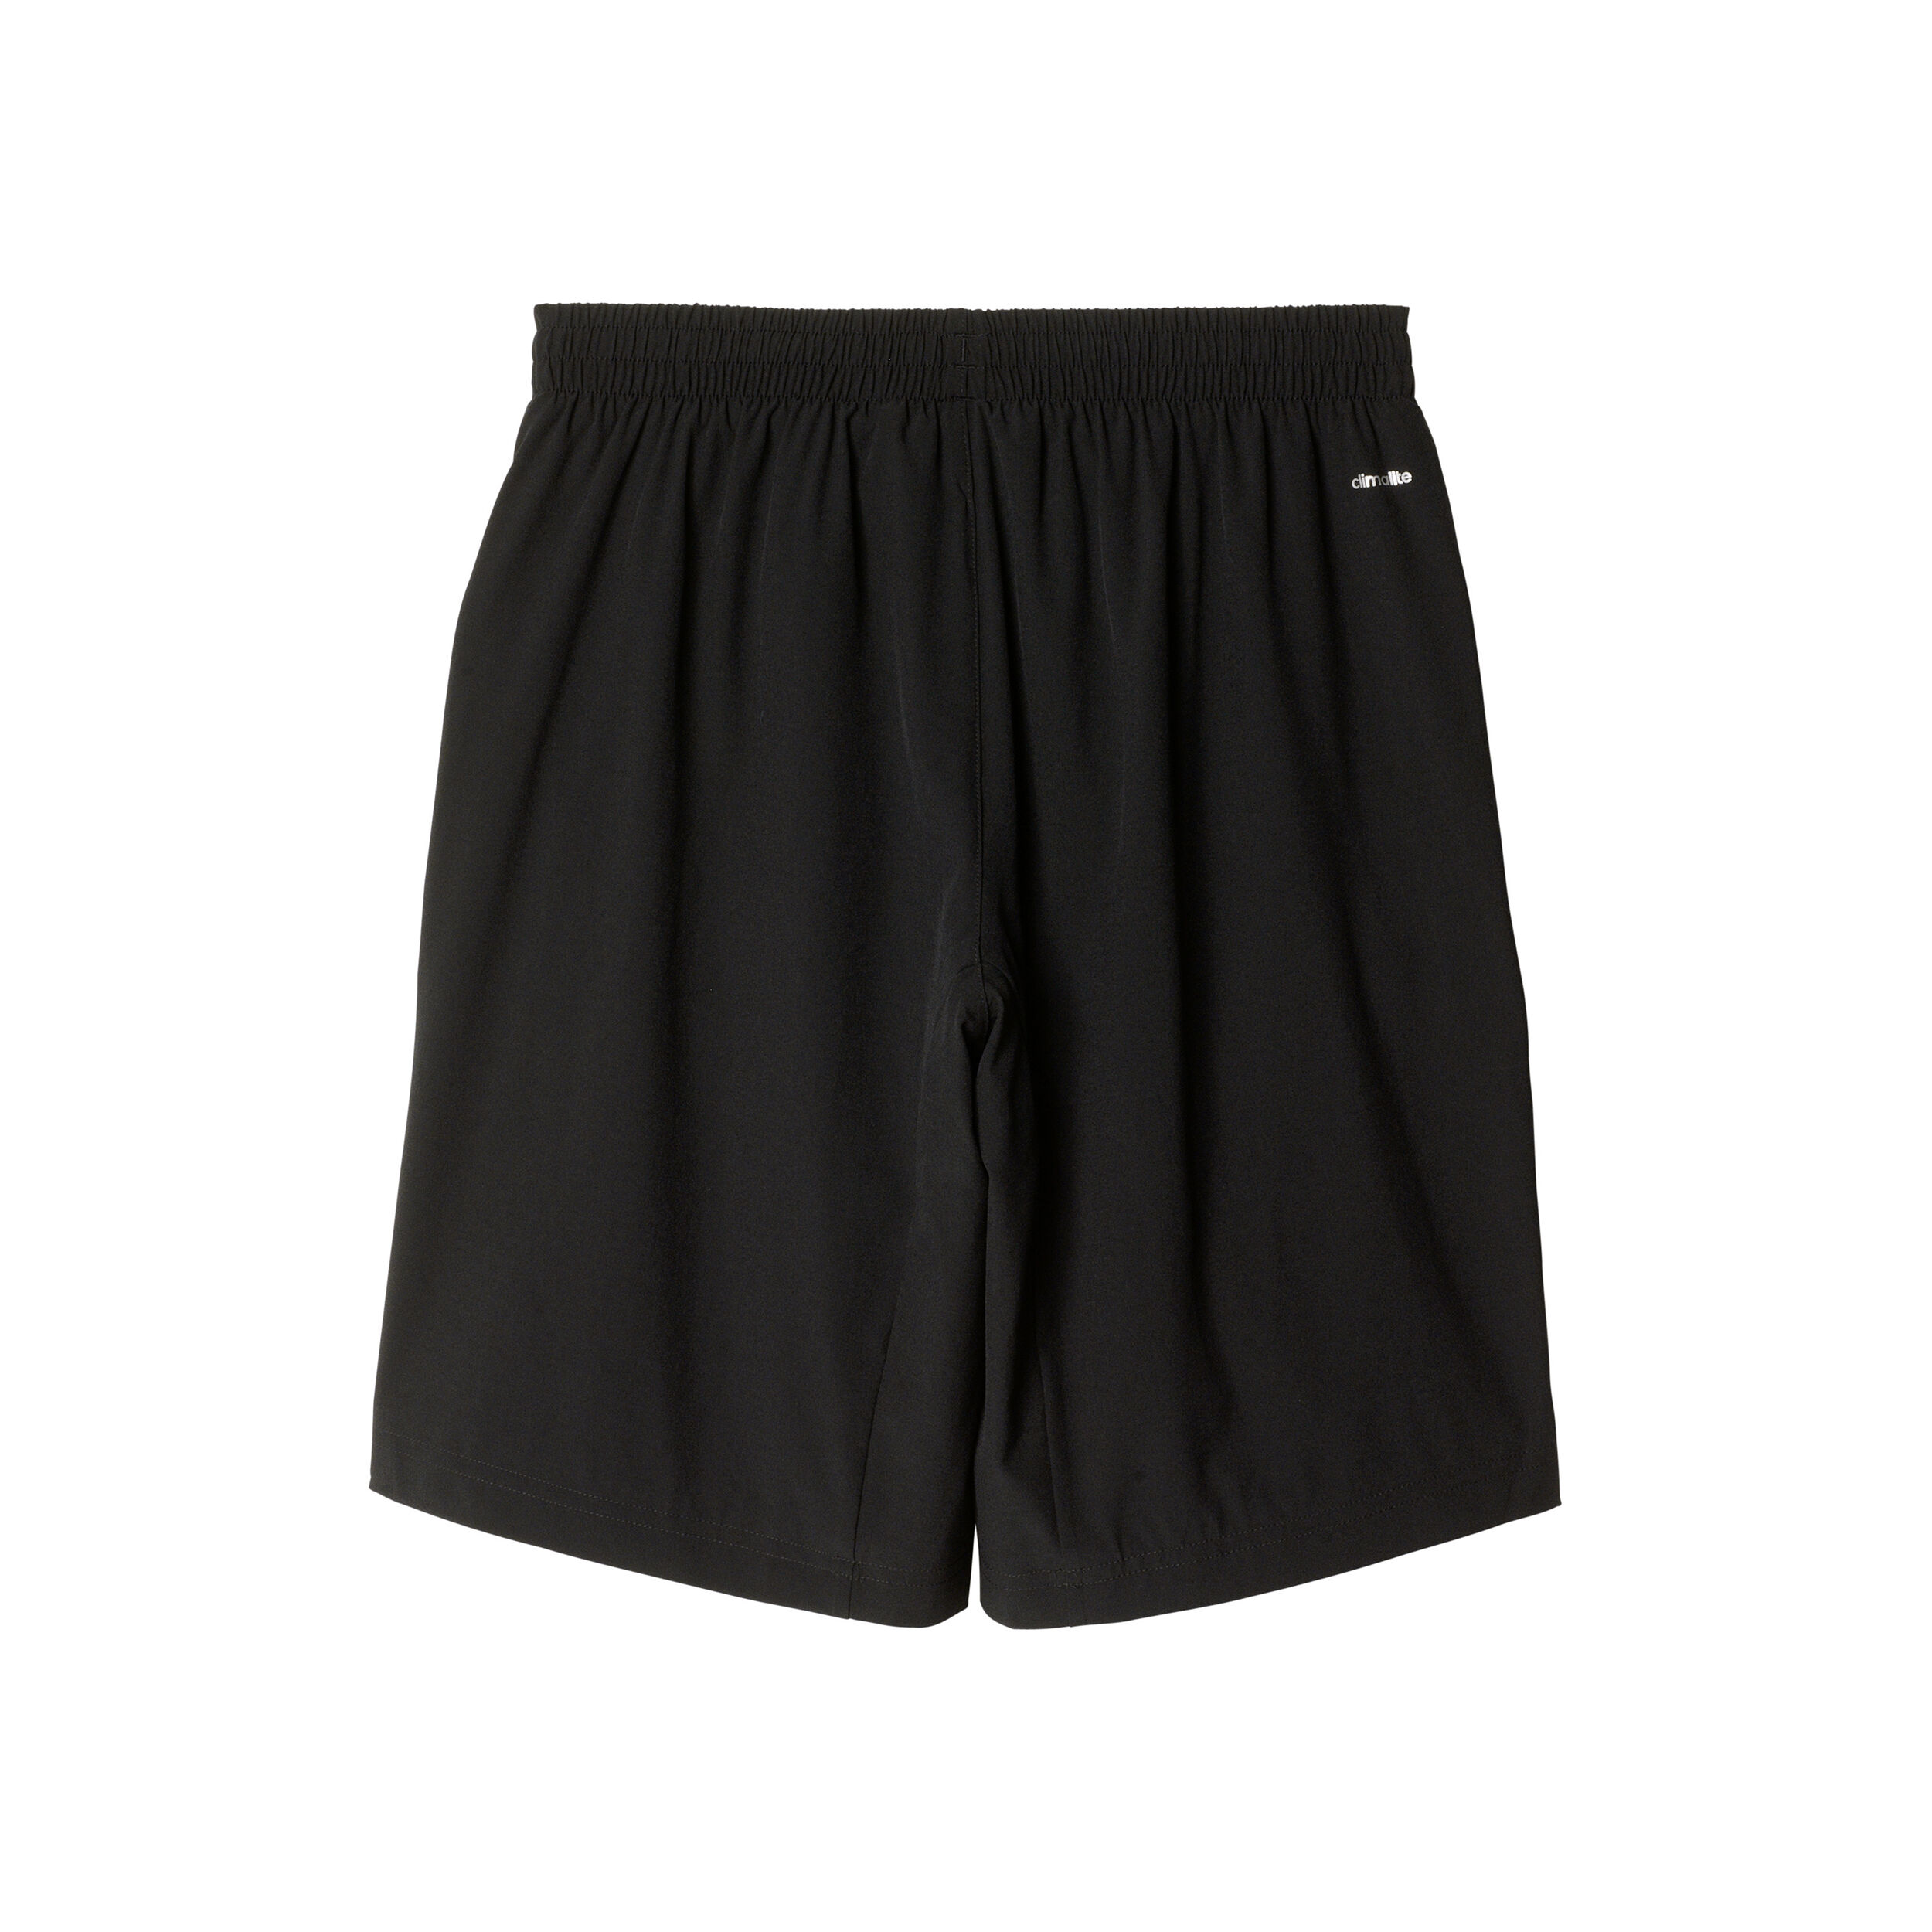 adidas Climalite Swat Shorts Garçons Noir